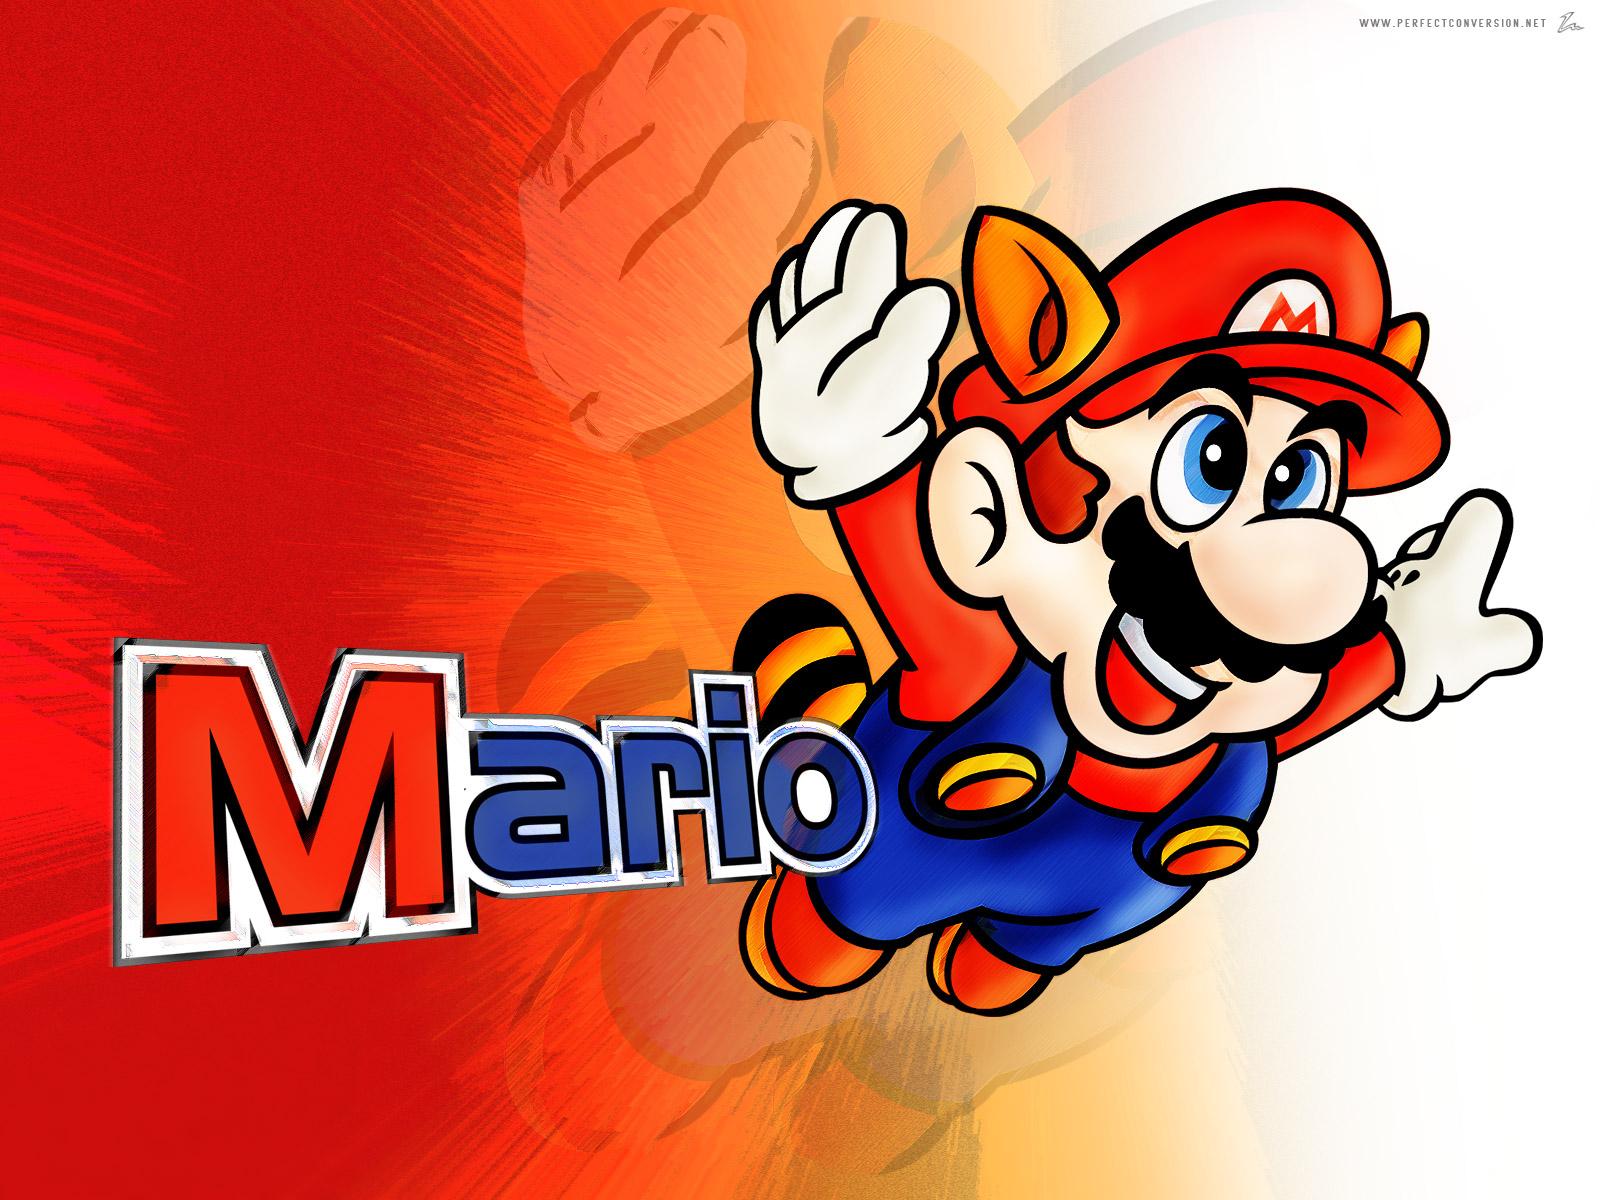 Super Mario Bros 3 Background: Super Mario 3 Wallpaper ·①